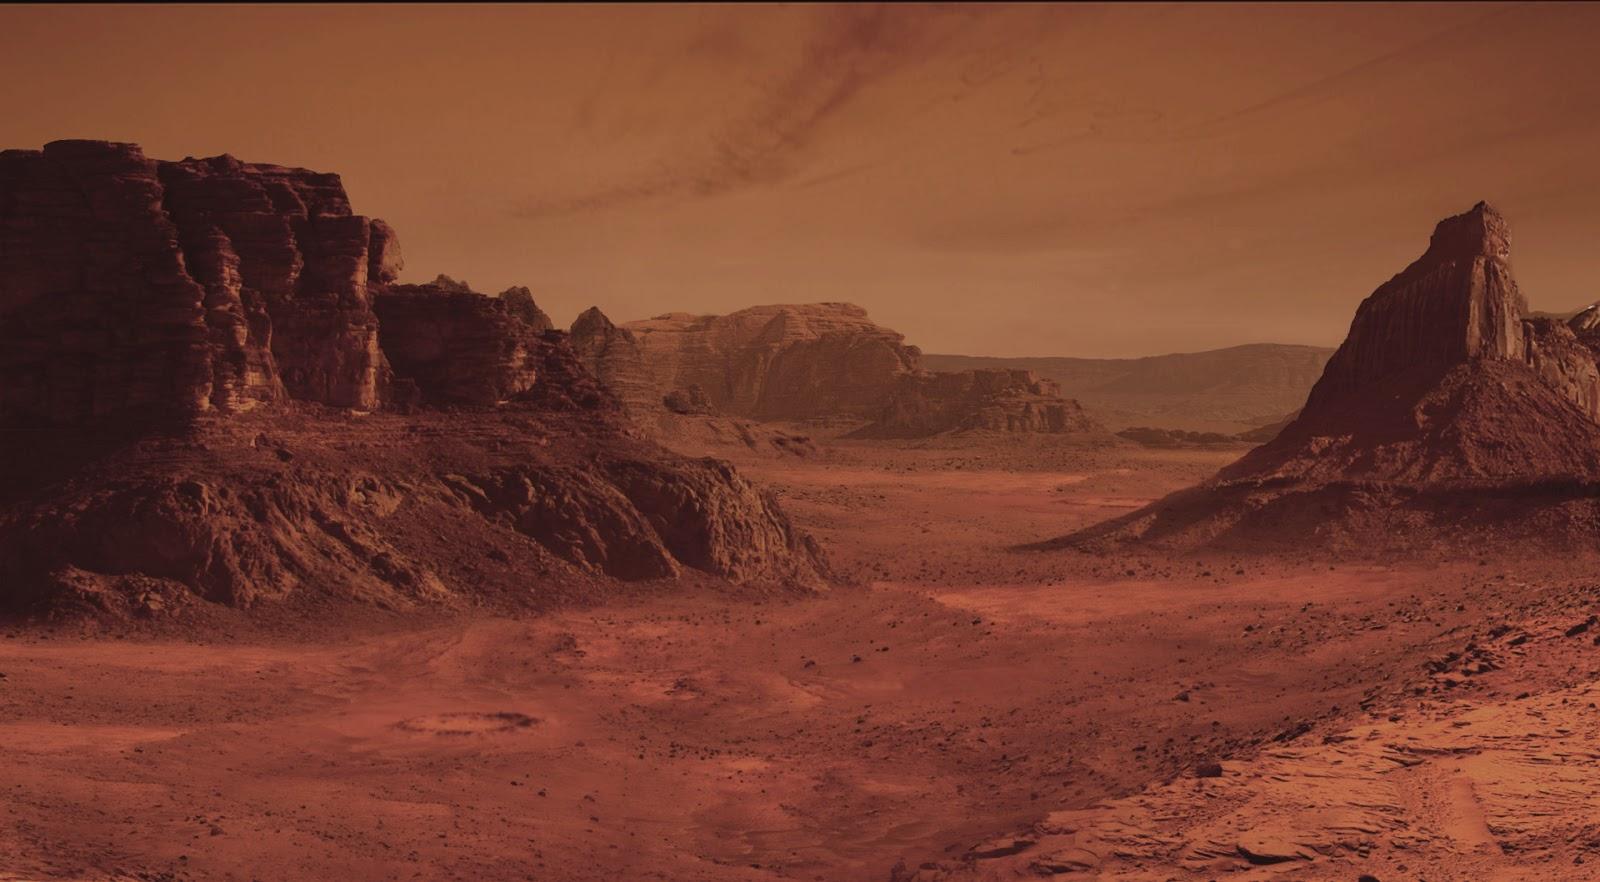 Martian landscape by Amante Lombardi